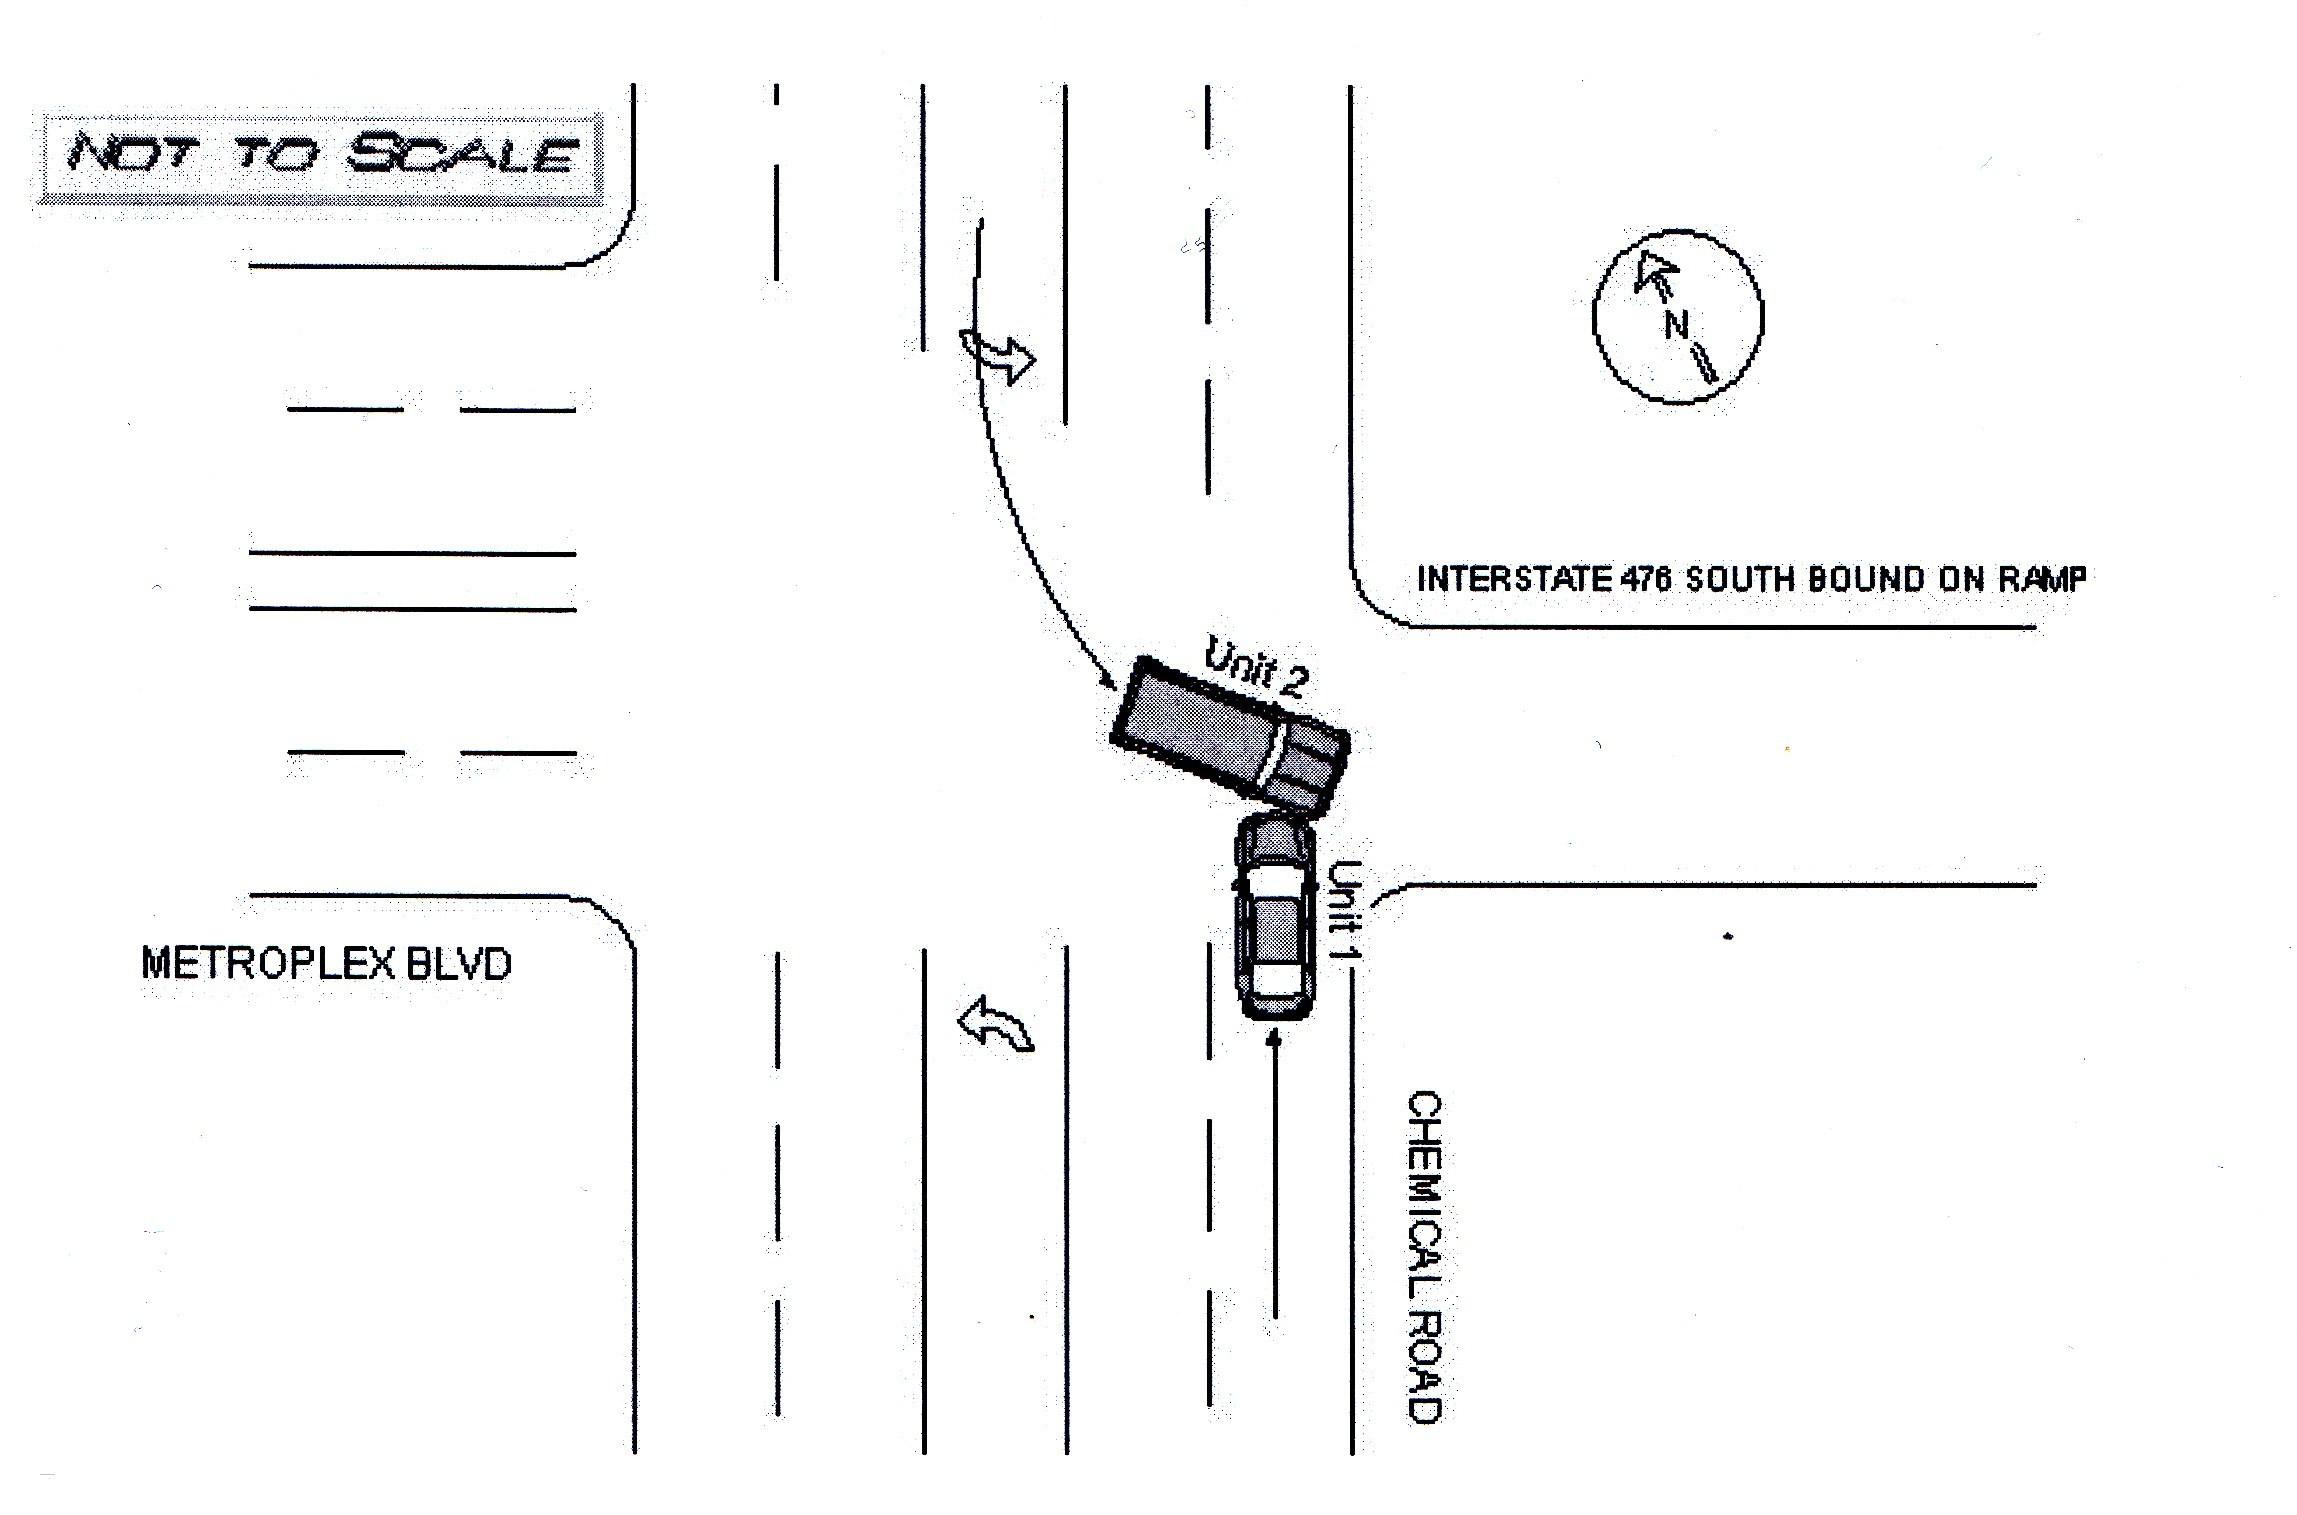 Truck Damage Diagram 27 Of Crew Cab Truck Vehicle Damage